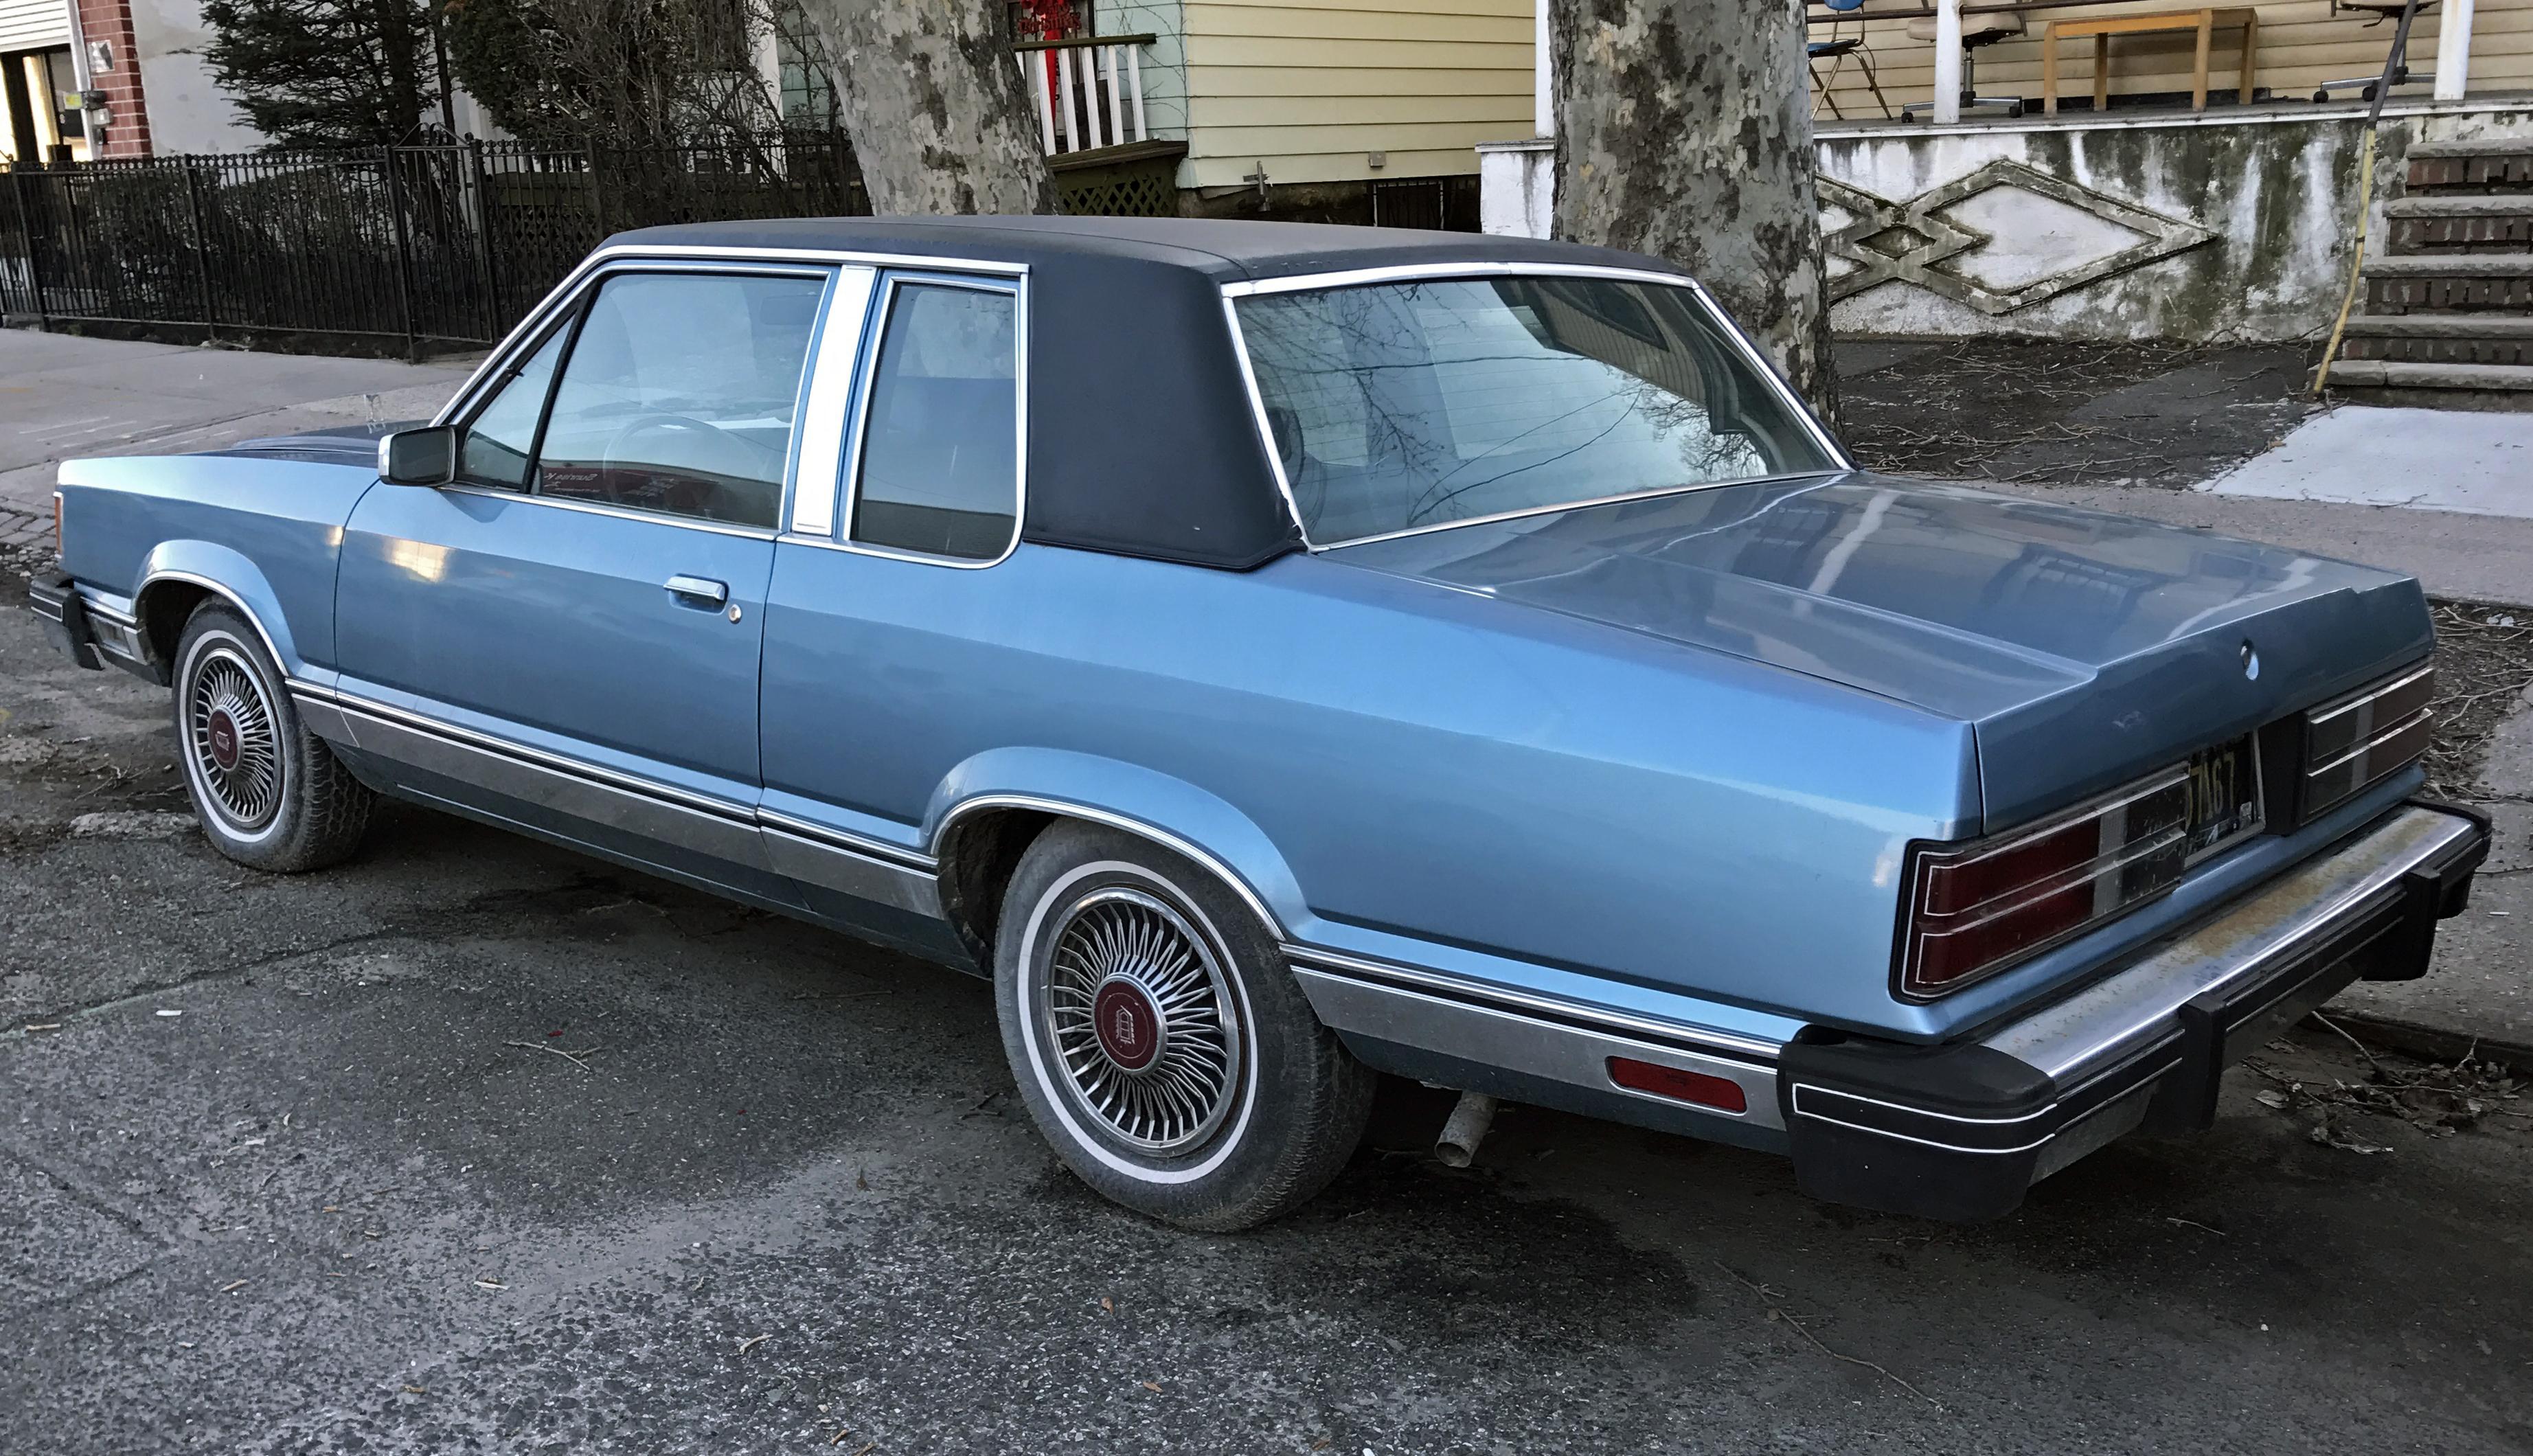 Ford Granada (North America) I 1975 - 1980 Sedan #1